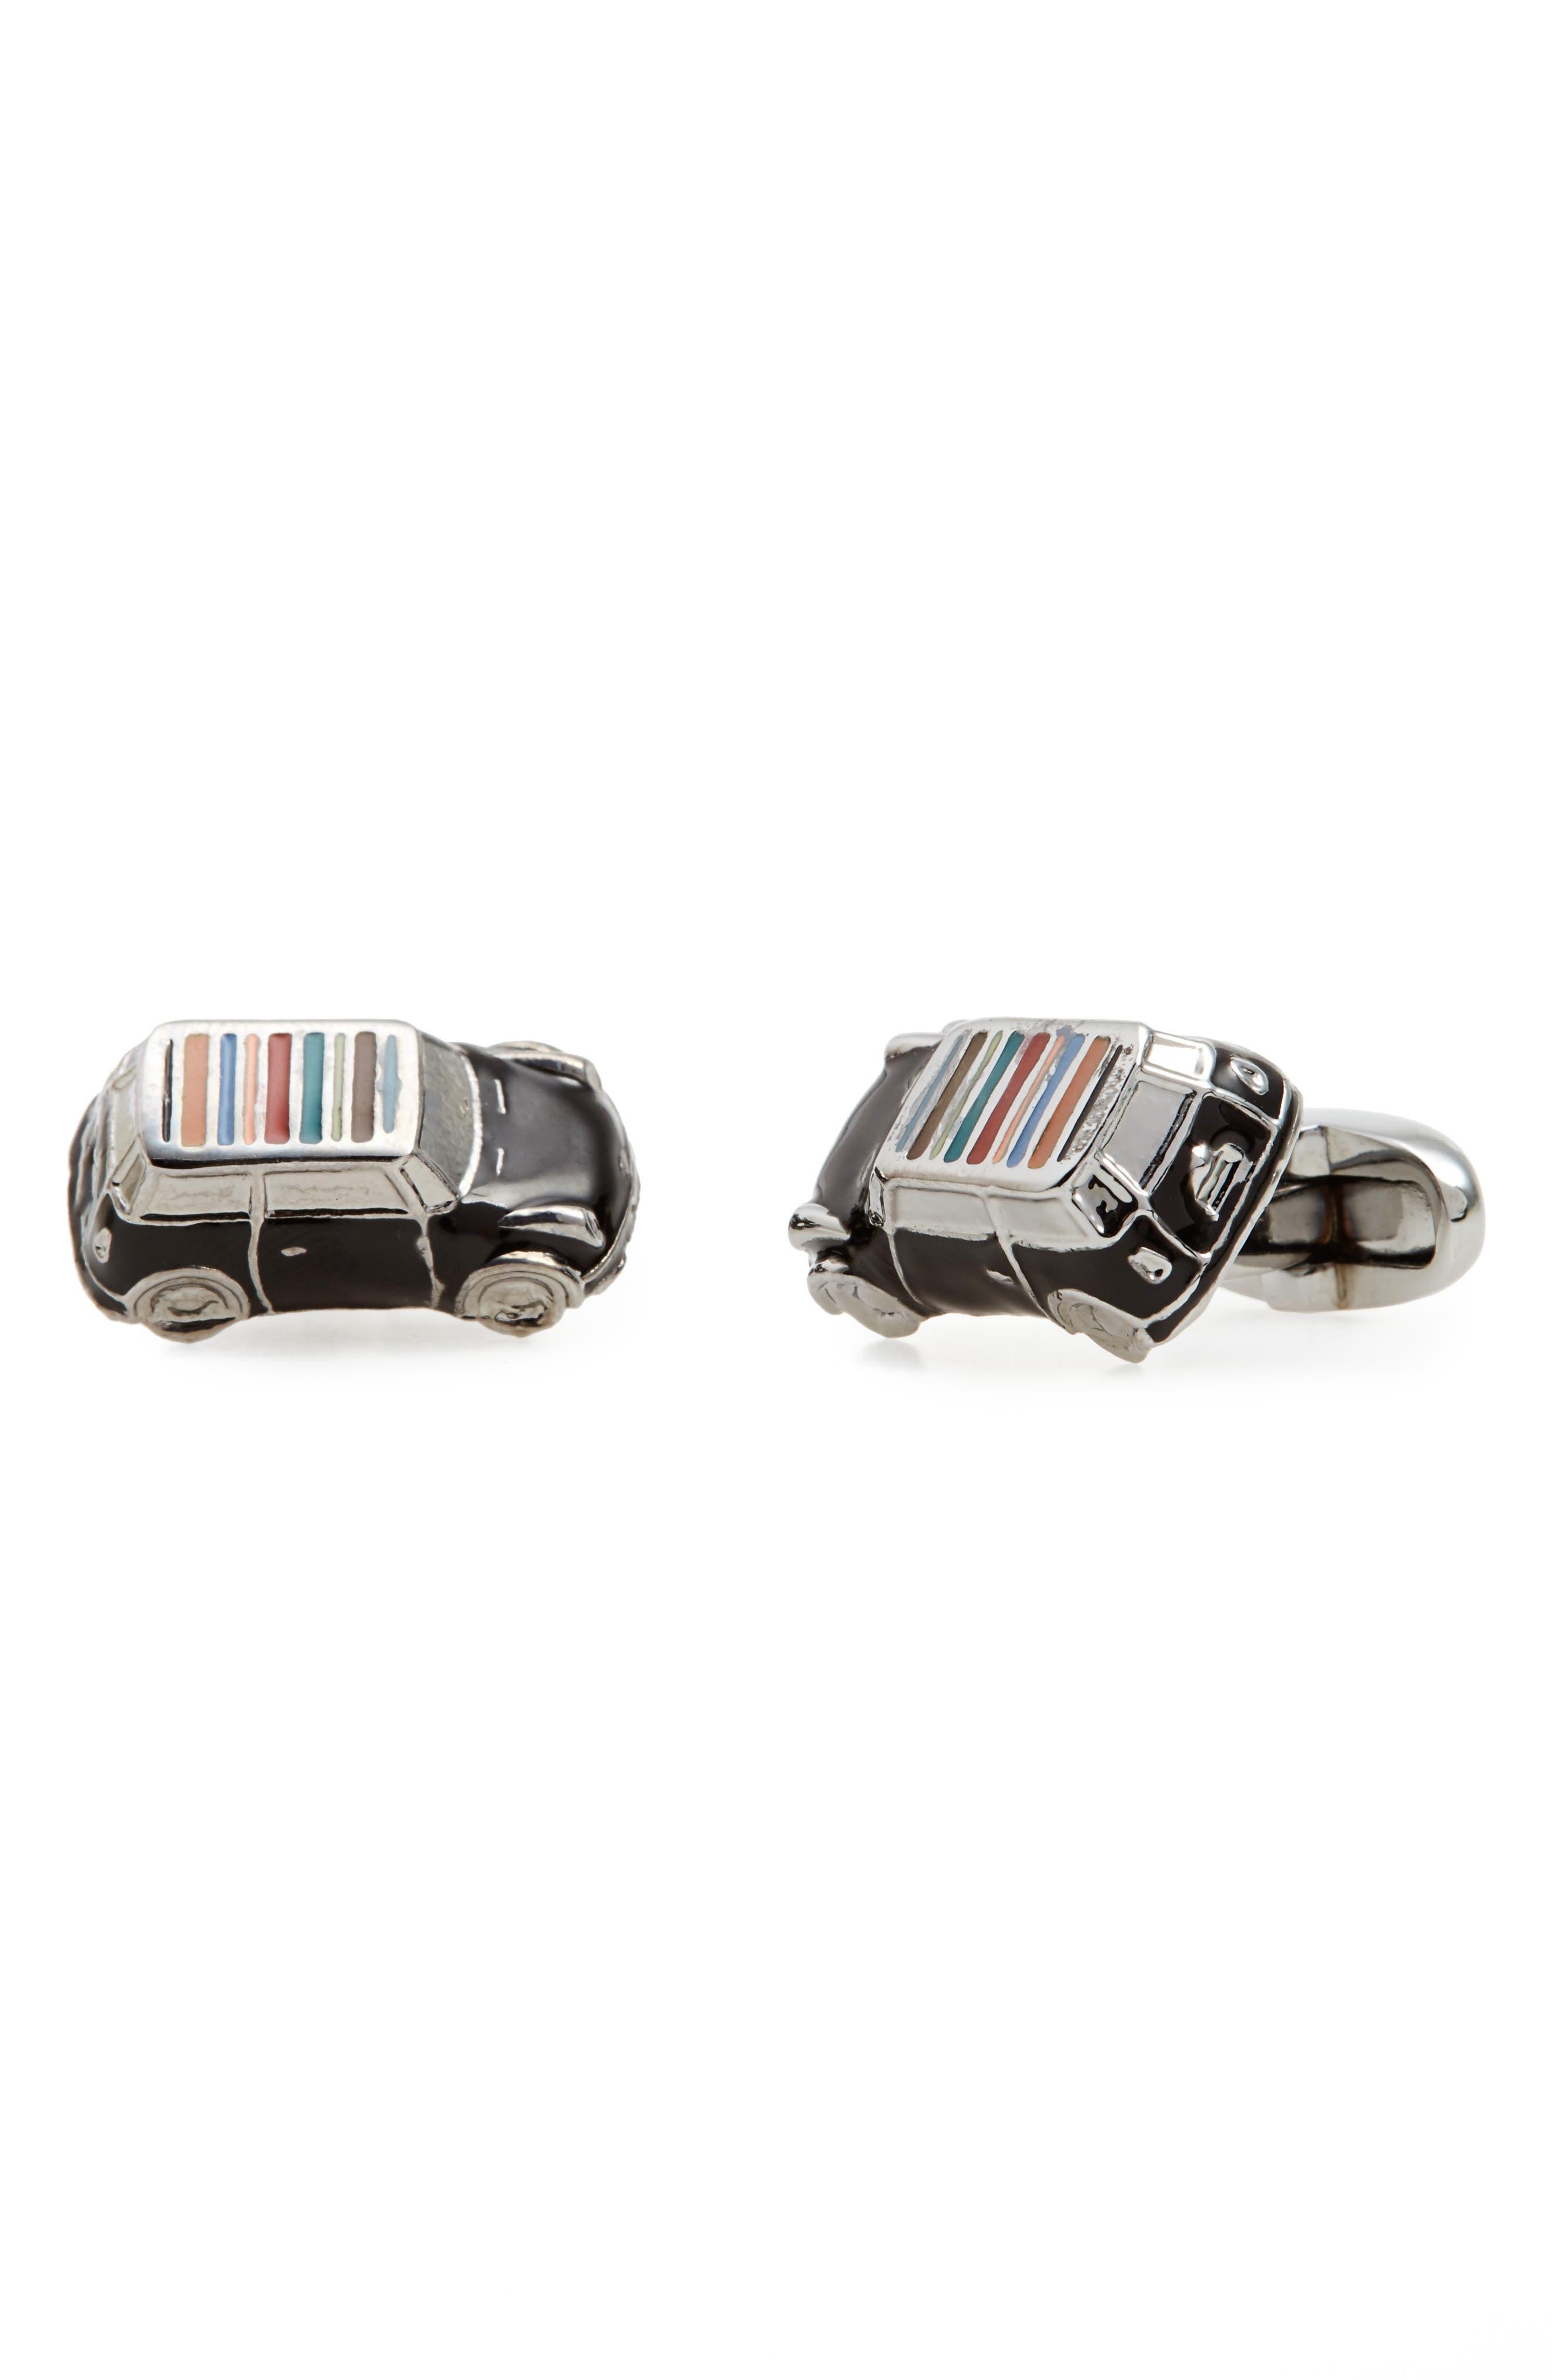 Enamel Stripe Car Cuff Links,                         Main,                         color, 040